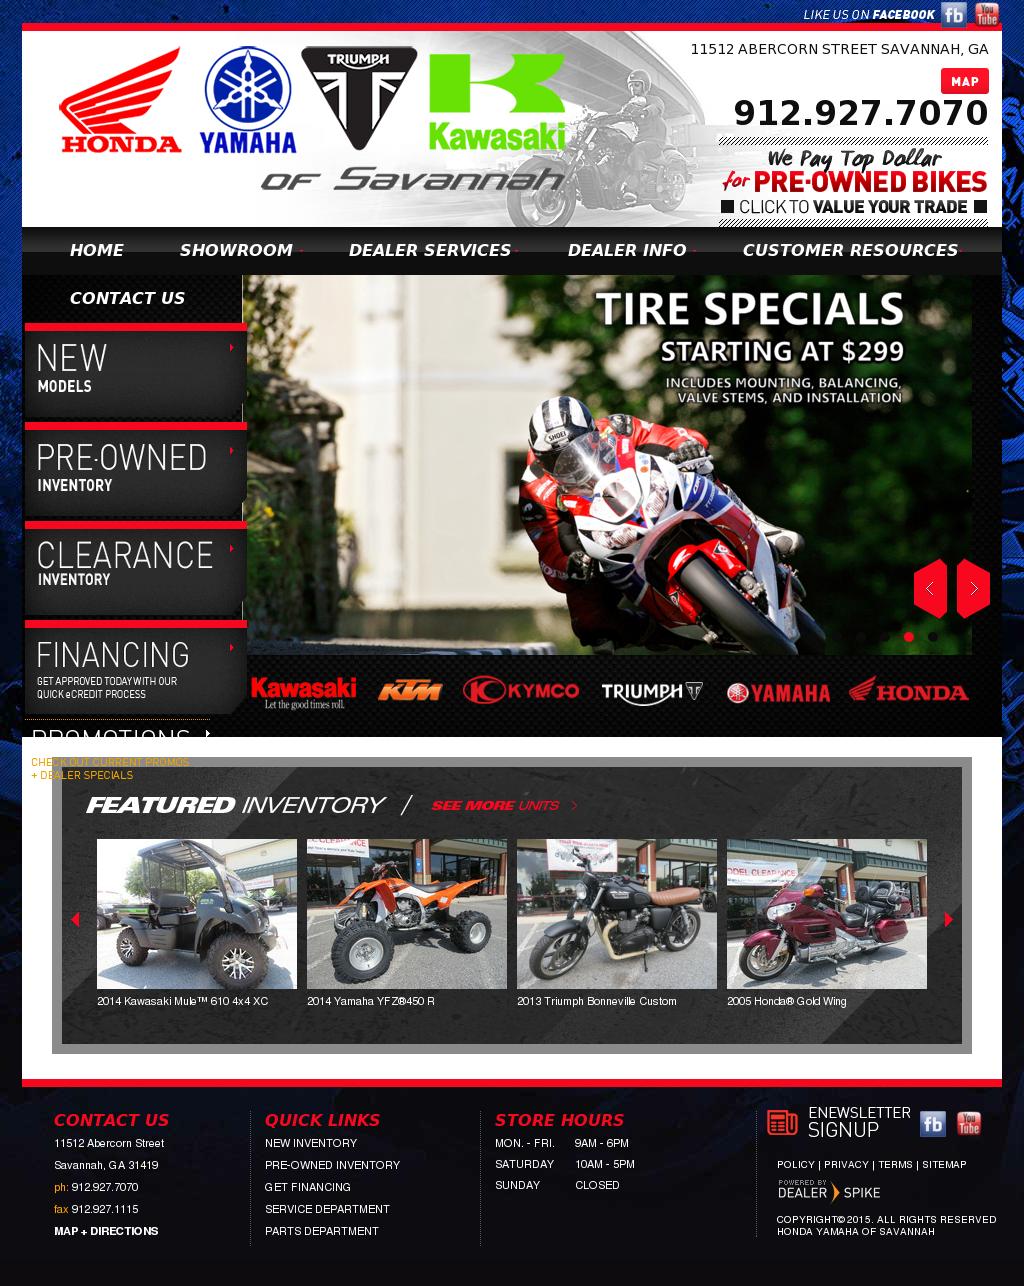 Honda Yamaha Of Savannah Competitors, Revenue And Employees   Owler Company  Profile